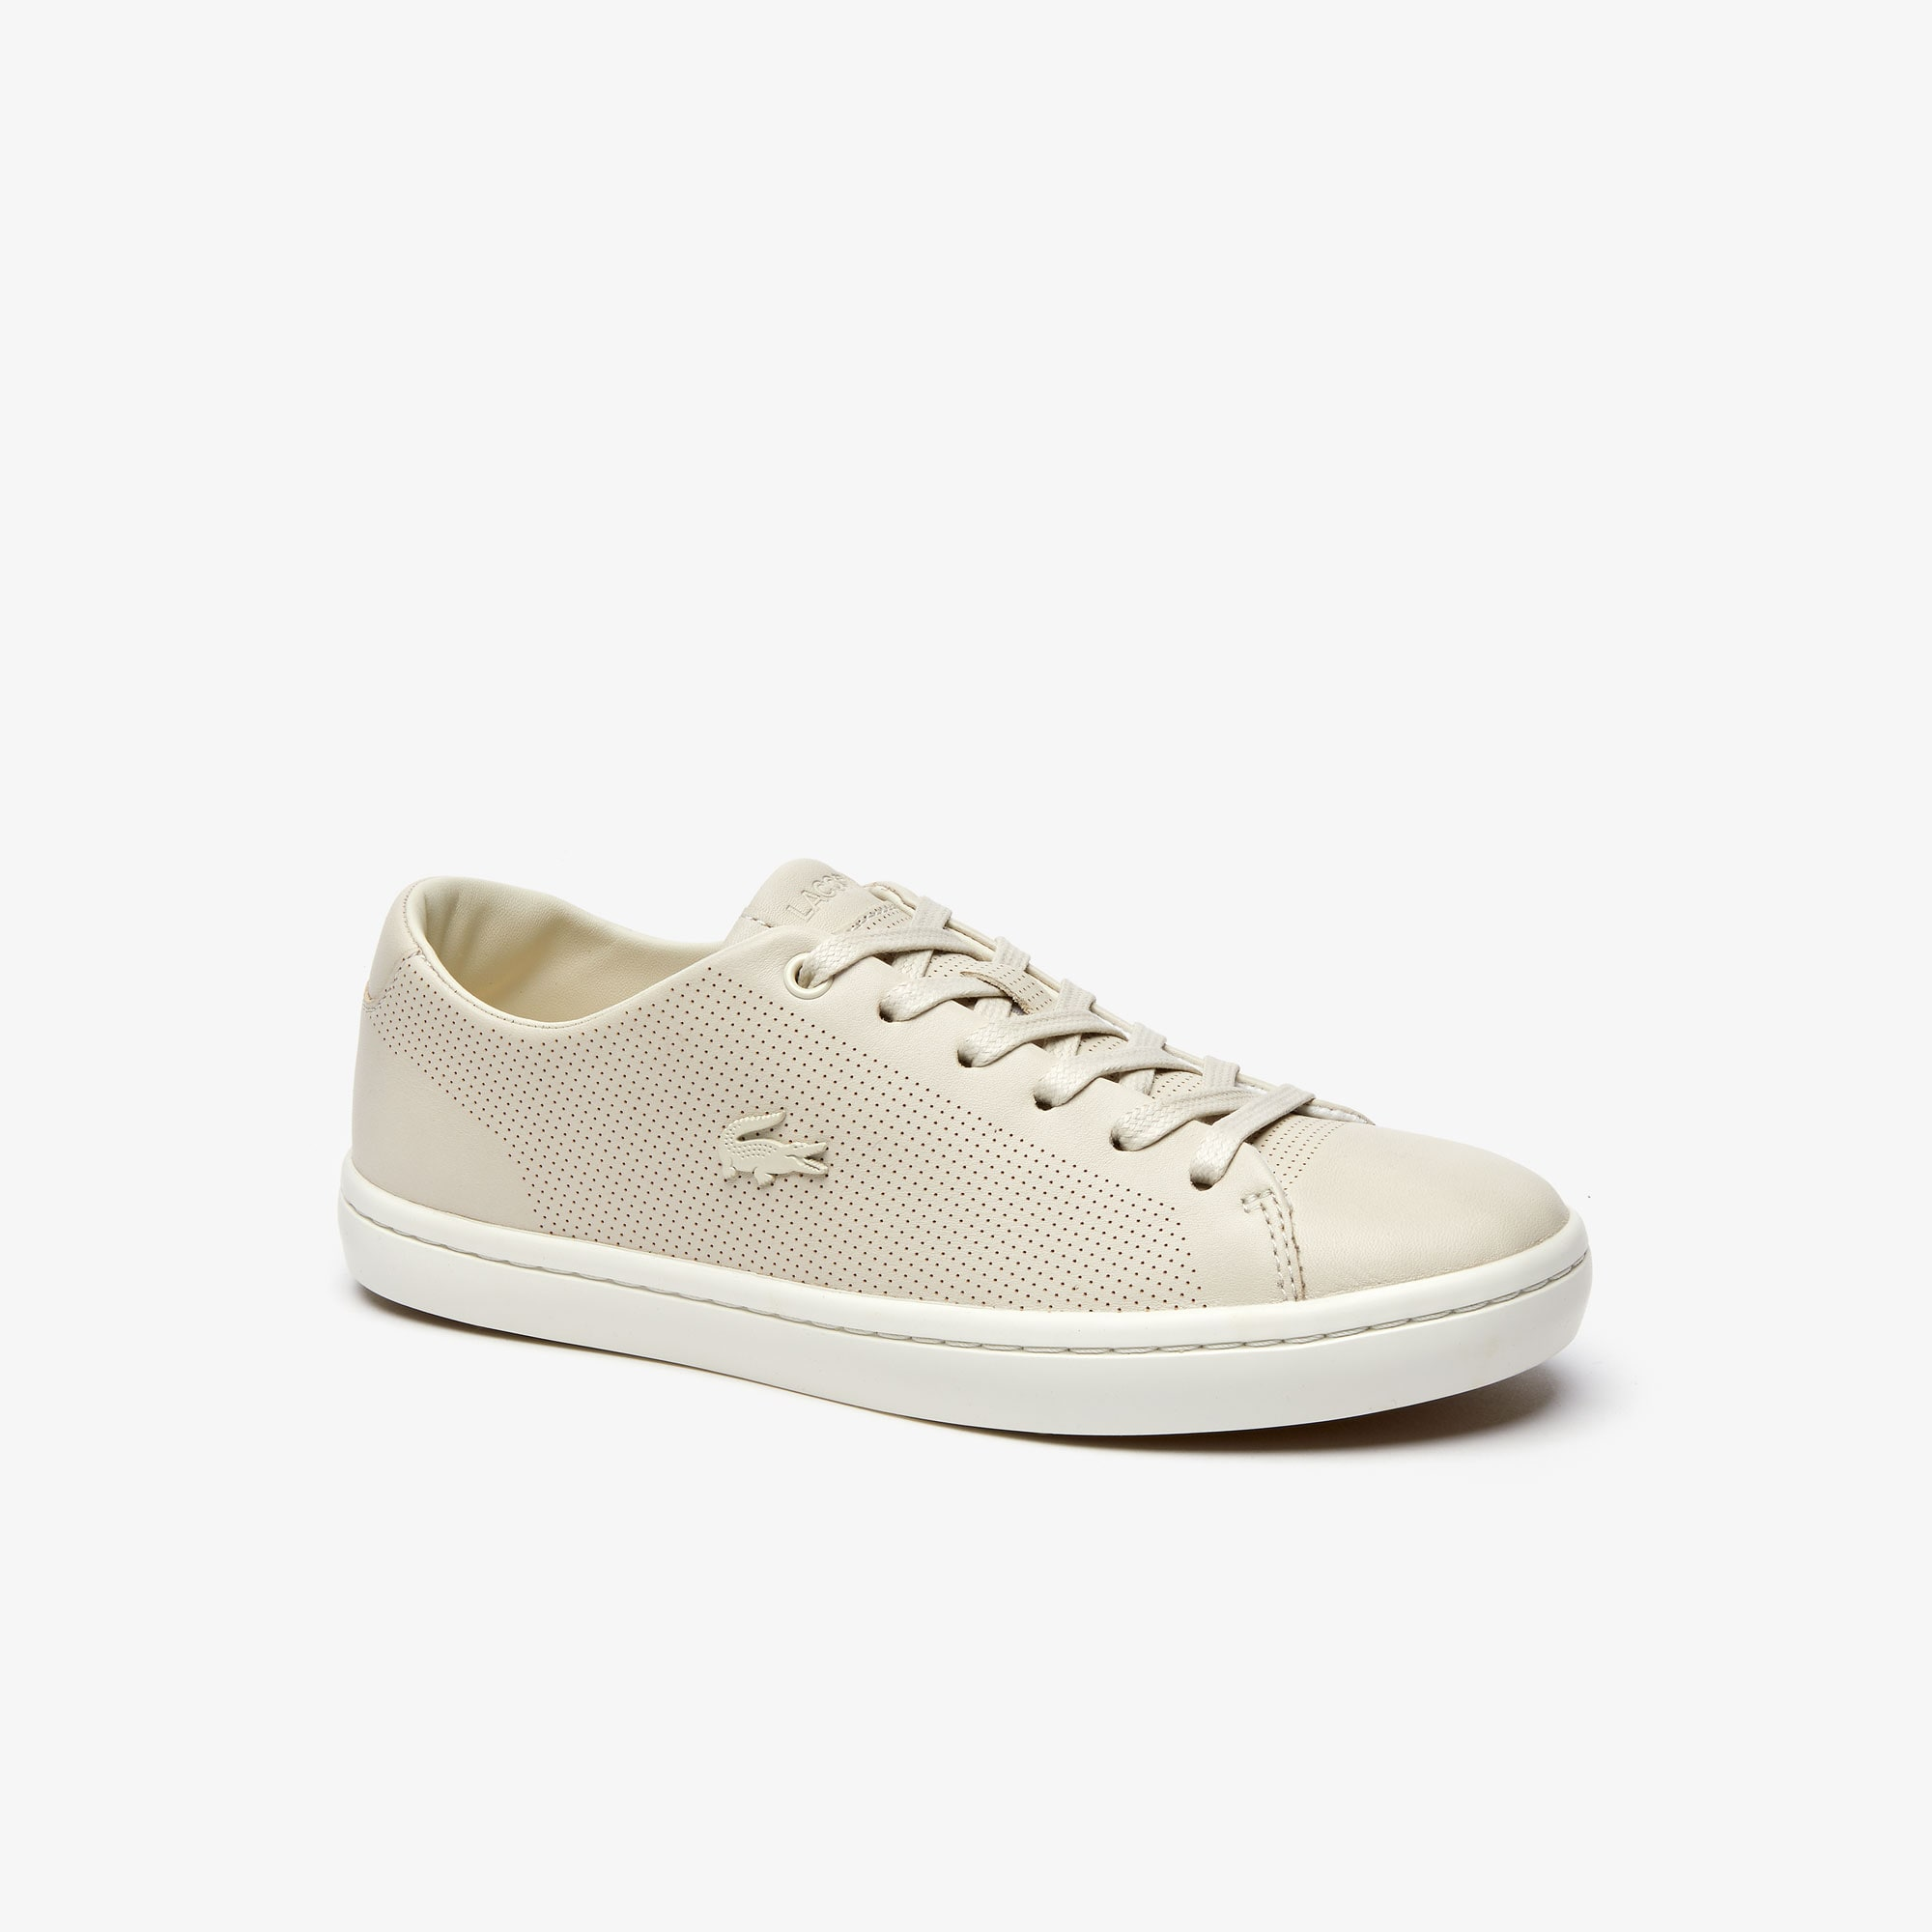 Lacoste Sneakers Women's Showcourt 2.0 Leather Sneakers